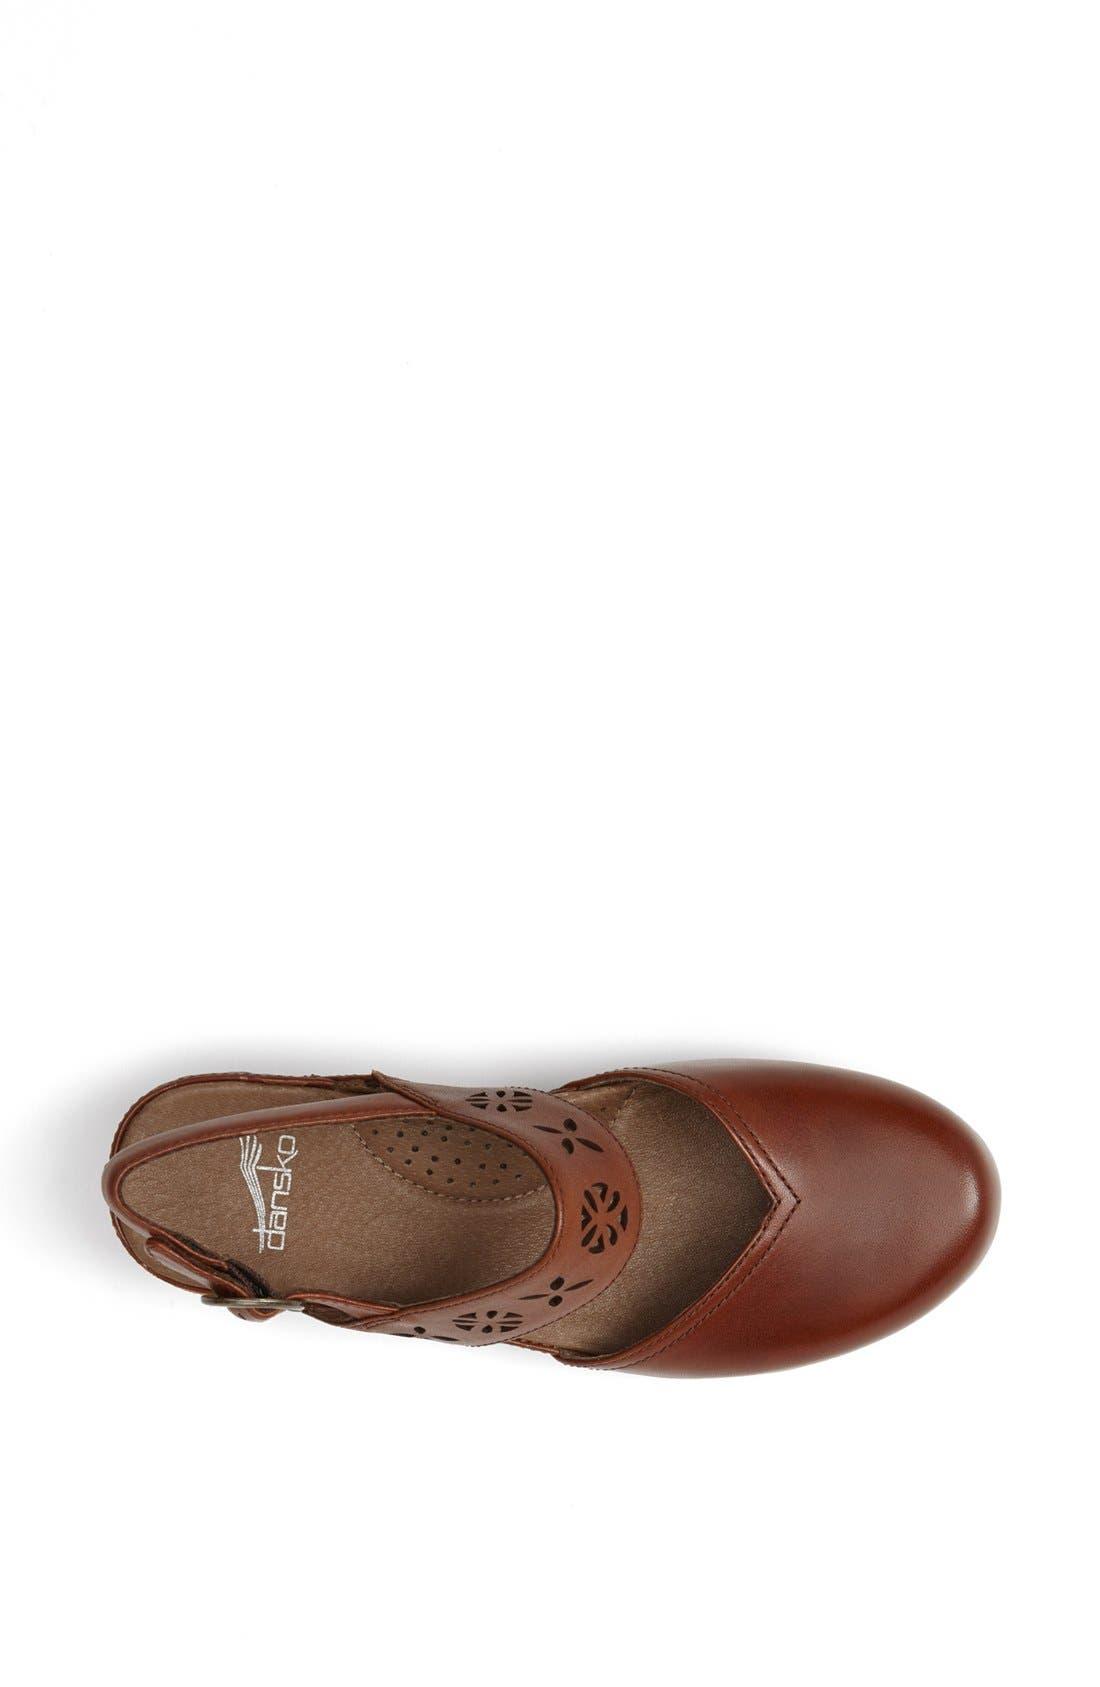 Alternate Image 3  - Dansko 'Trista' Leather Clog